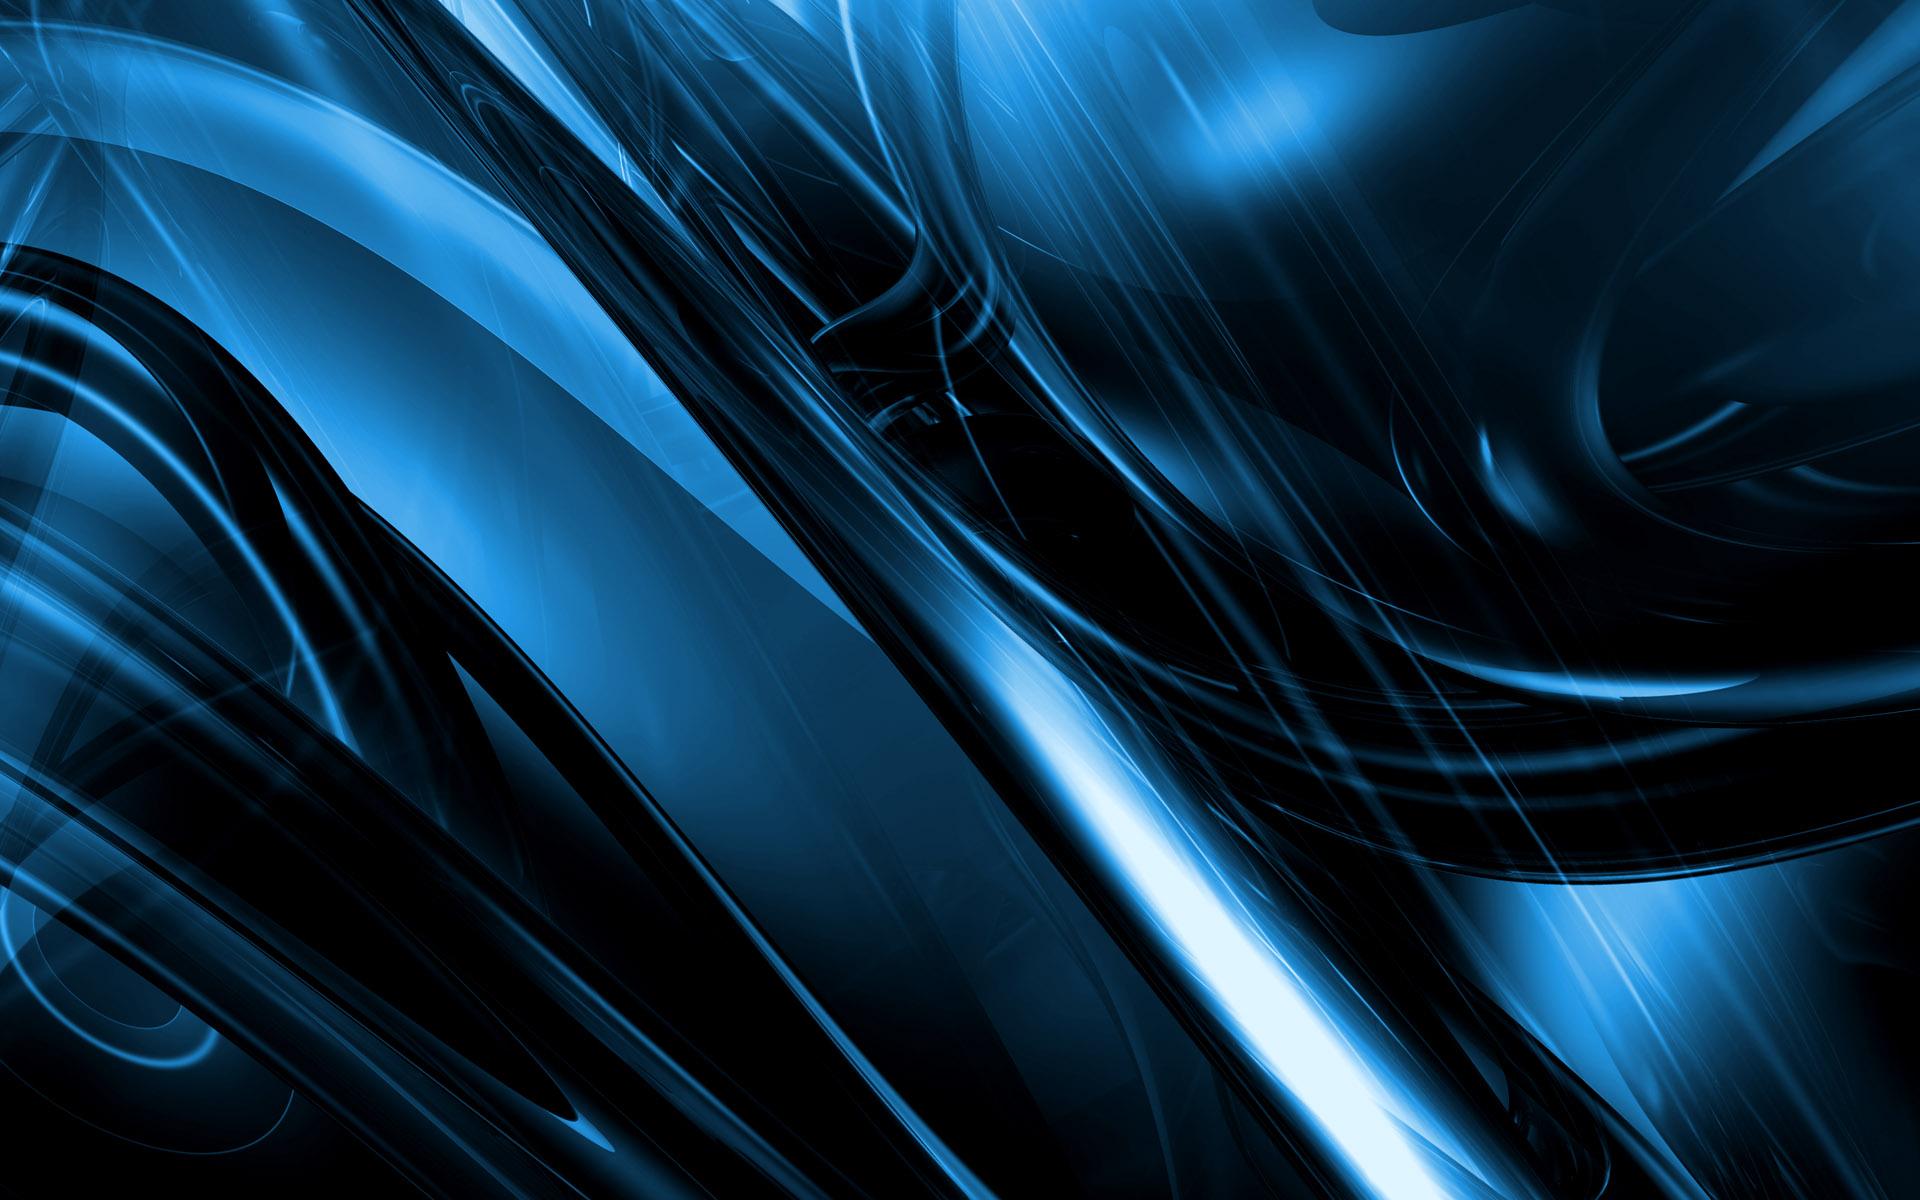 Bleu Fonds d'écran, Arrières-plan   1920x1200   ID:595928